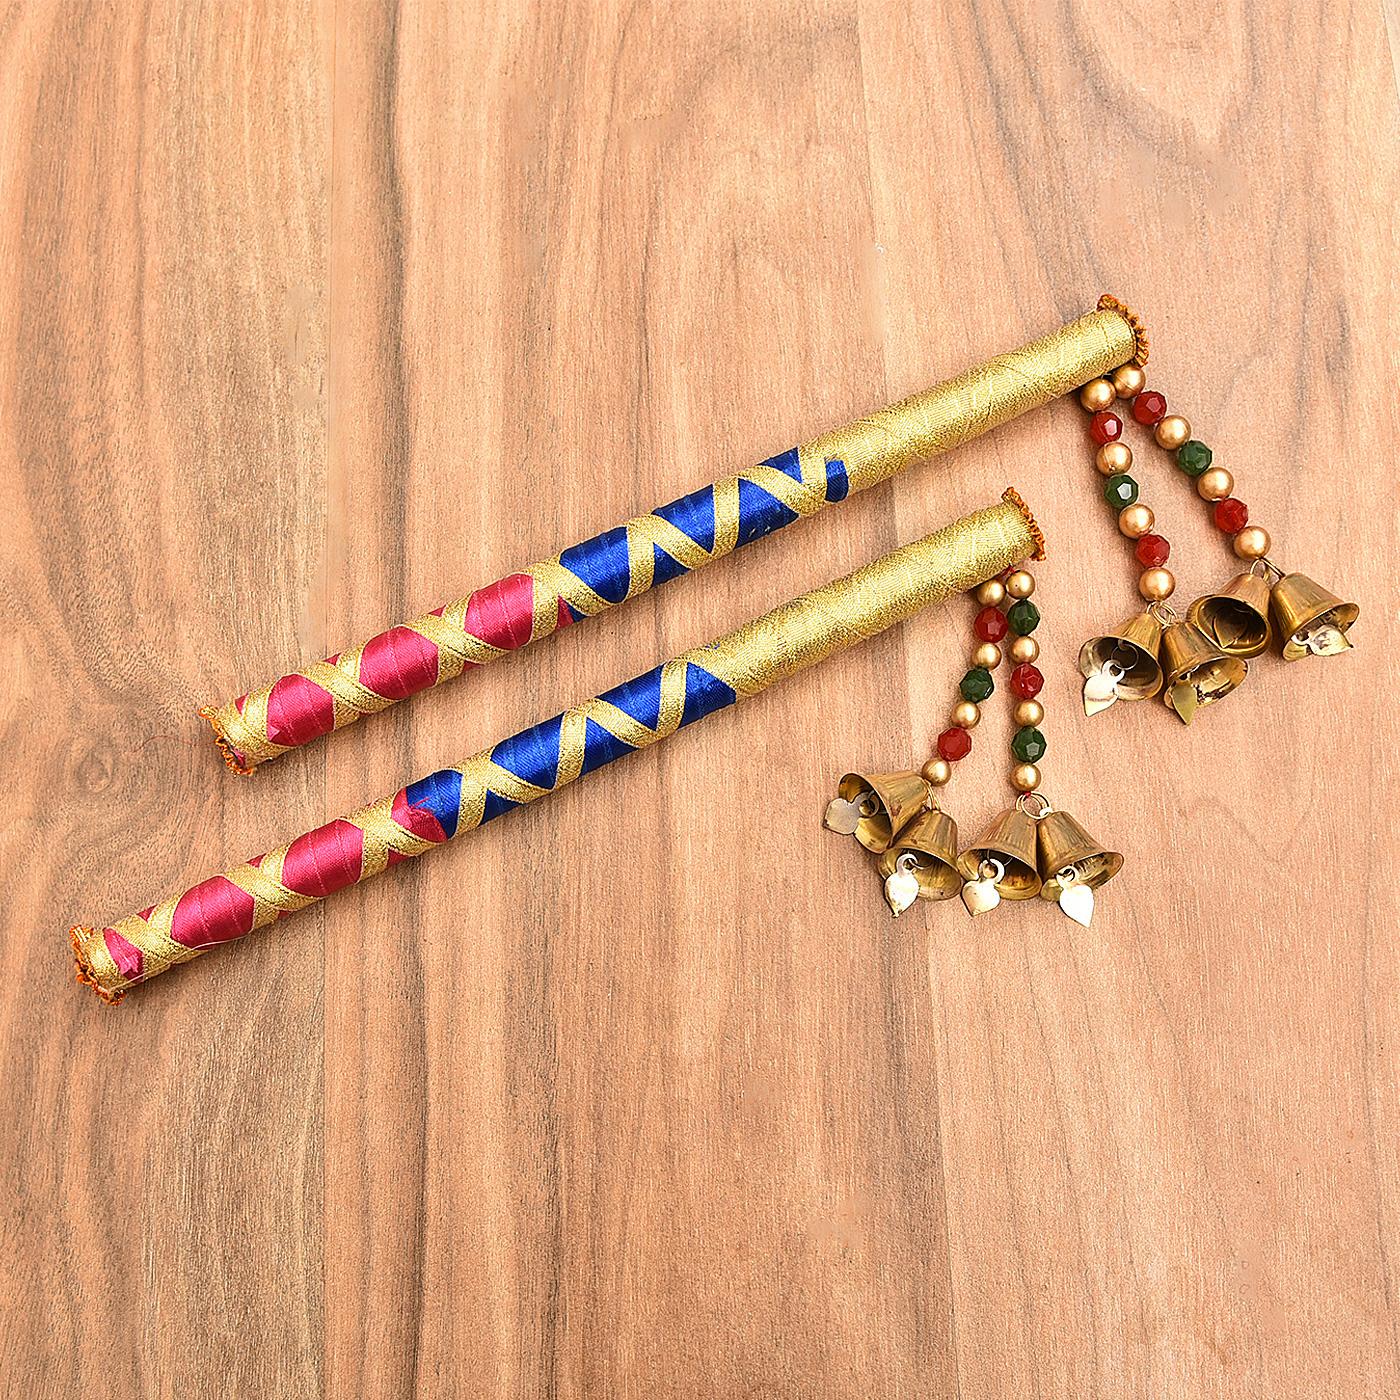 Colorful Wooden Dandiya Sticks